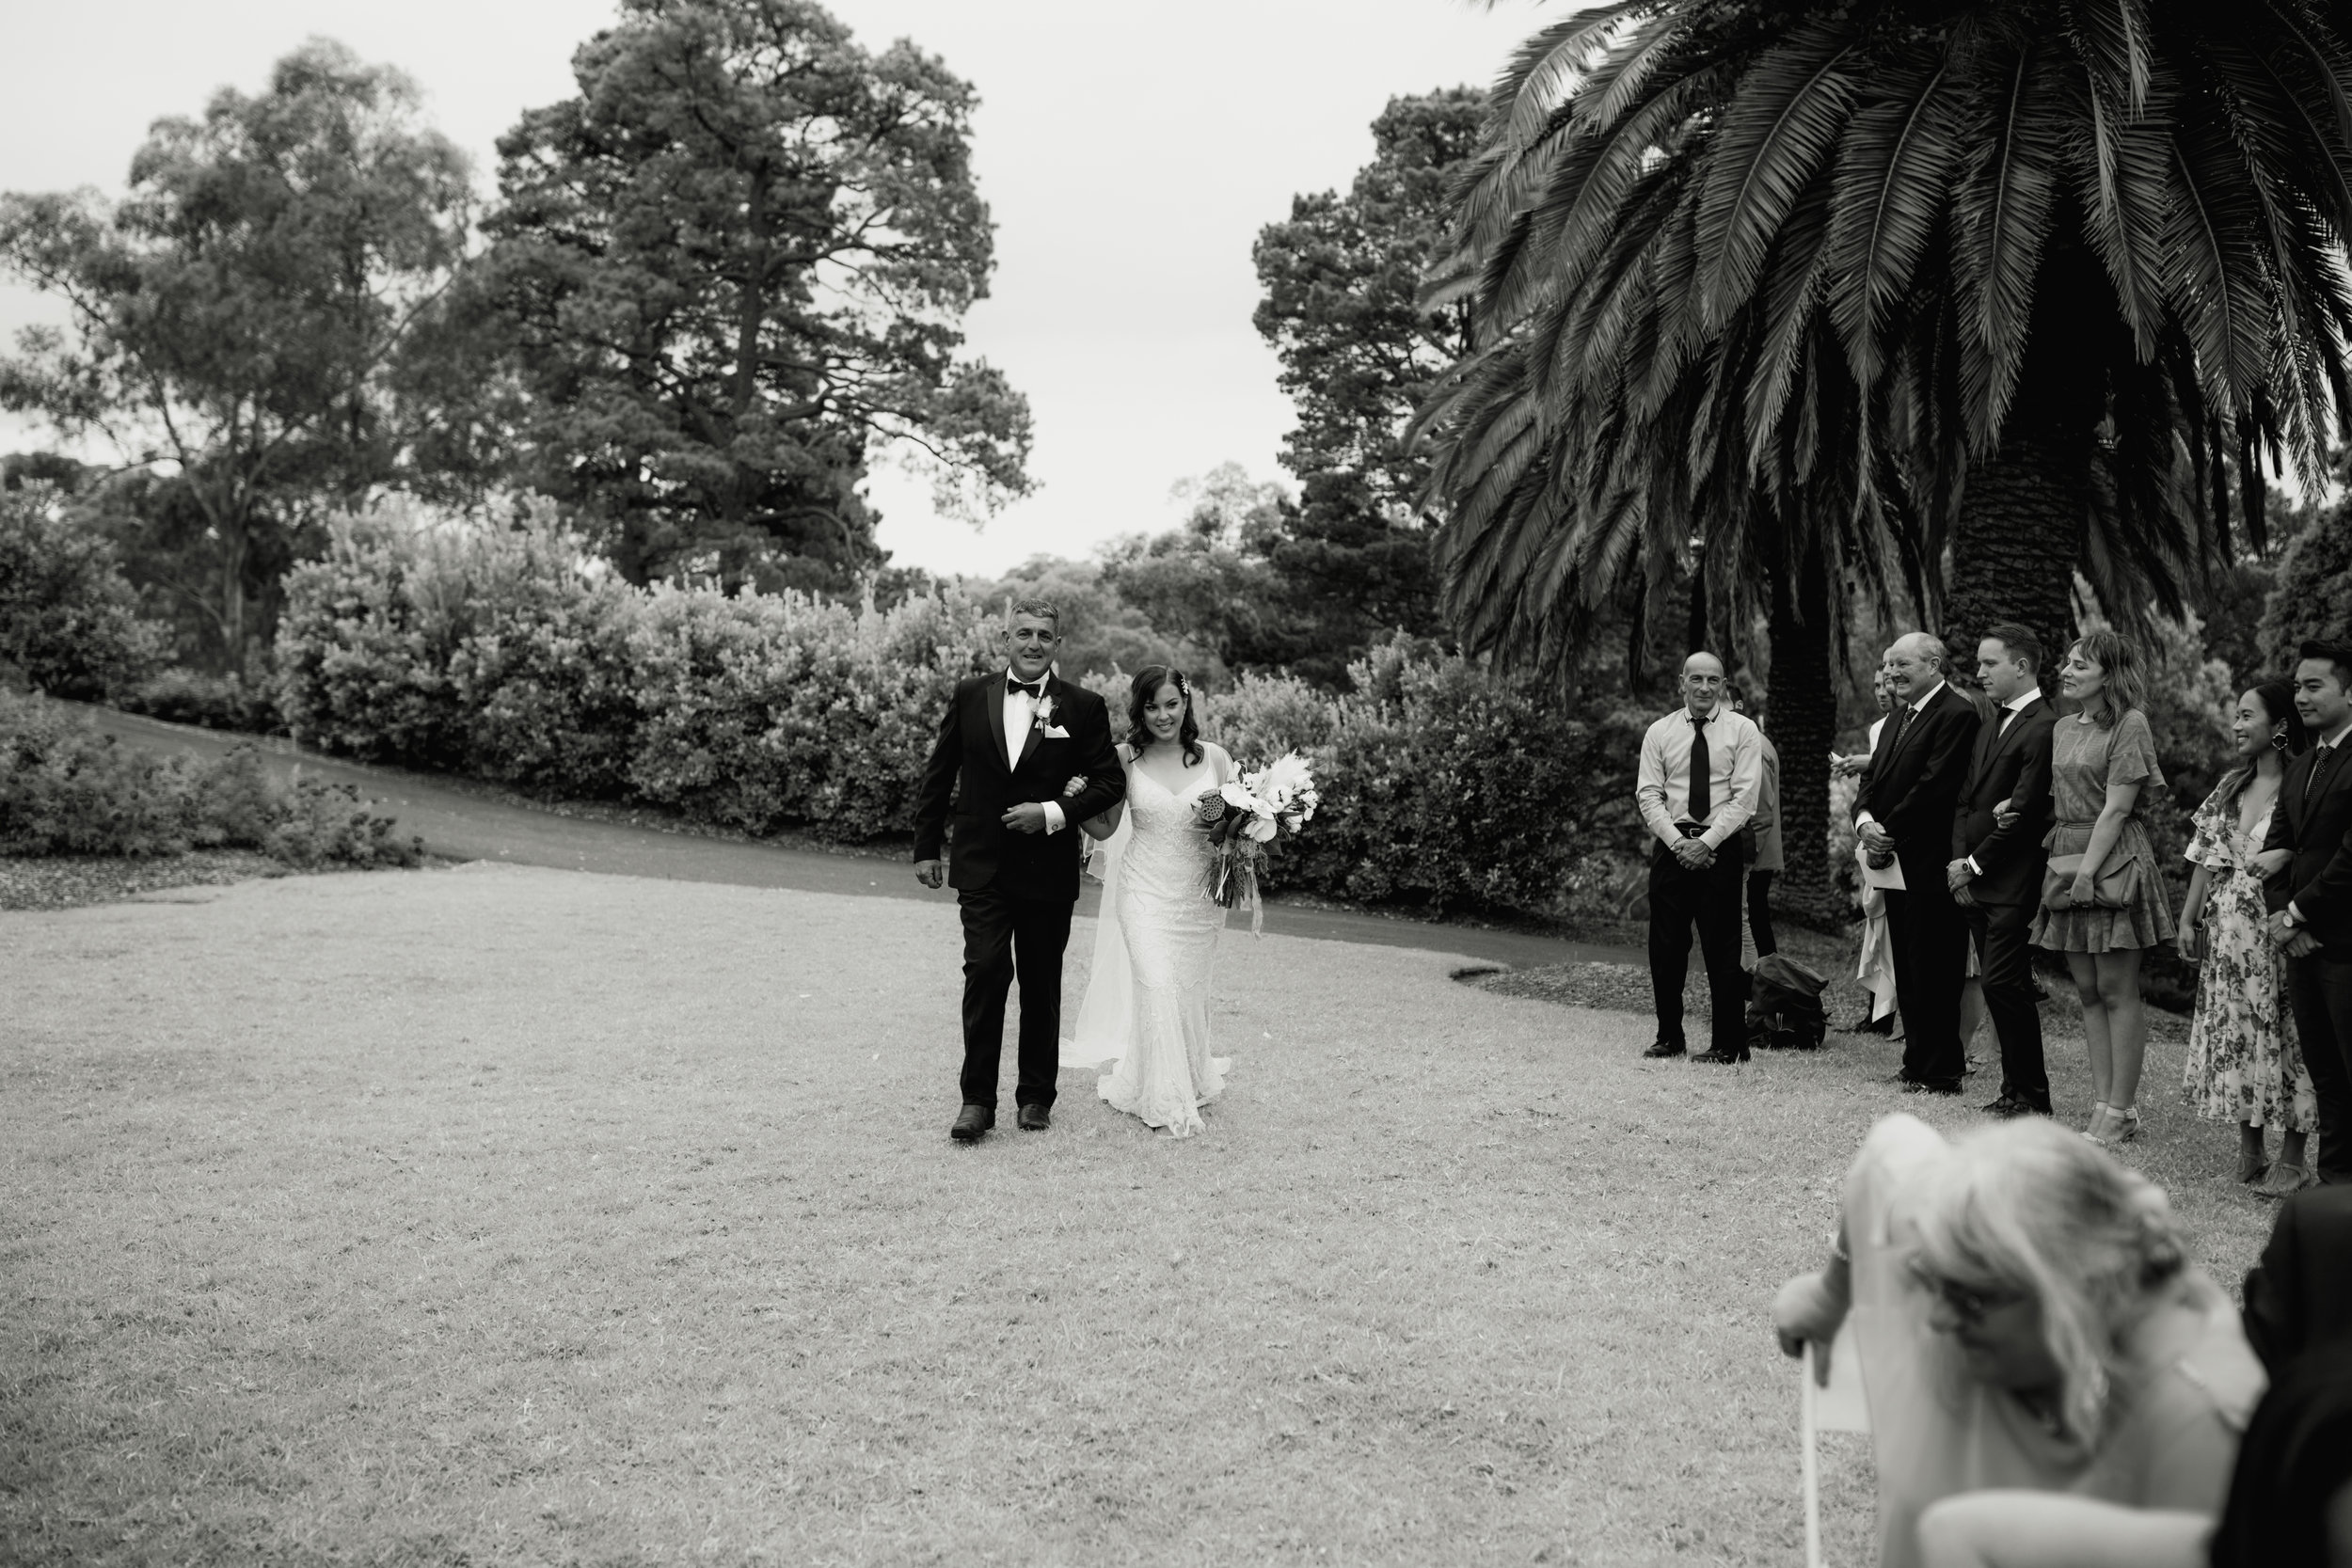 I-Got-You-Babe-Weddings-Melanie-Isaac0380.JPG